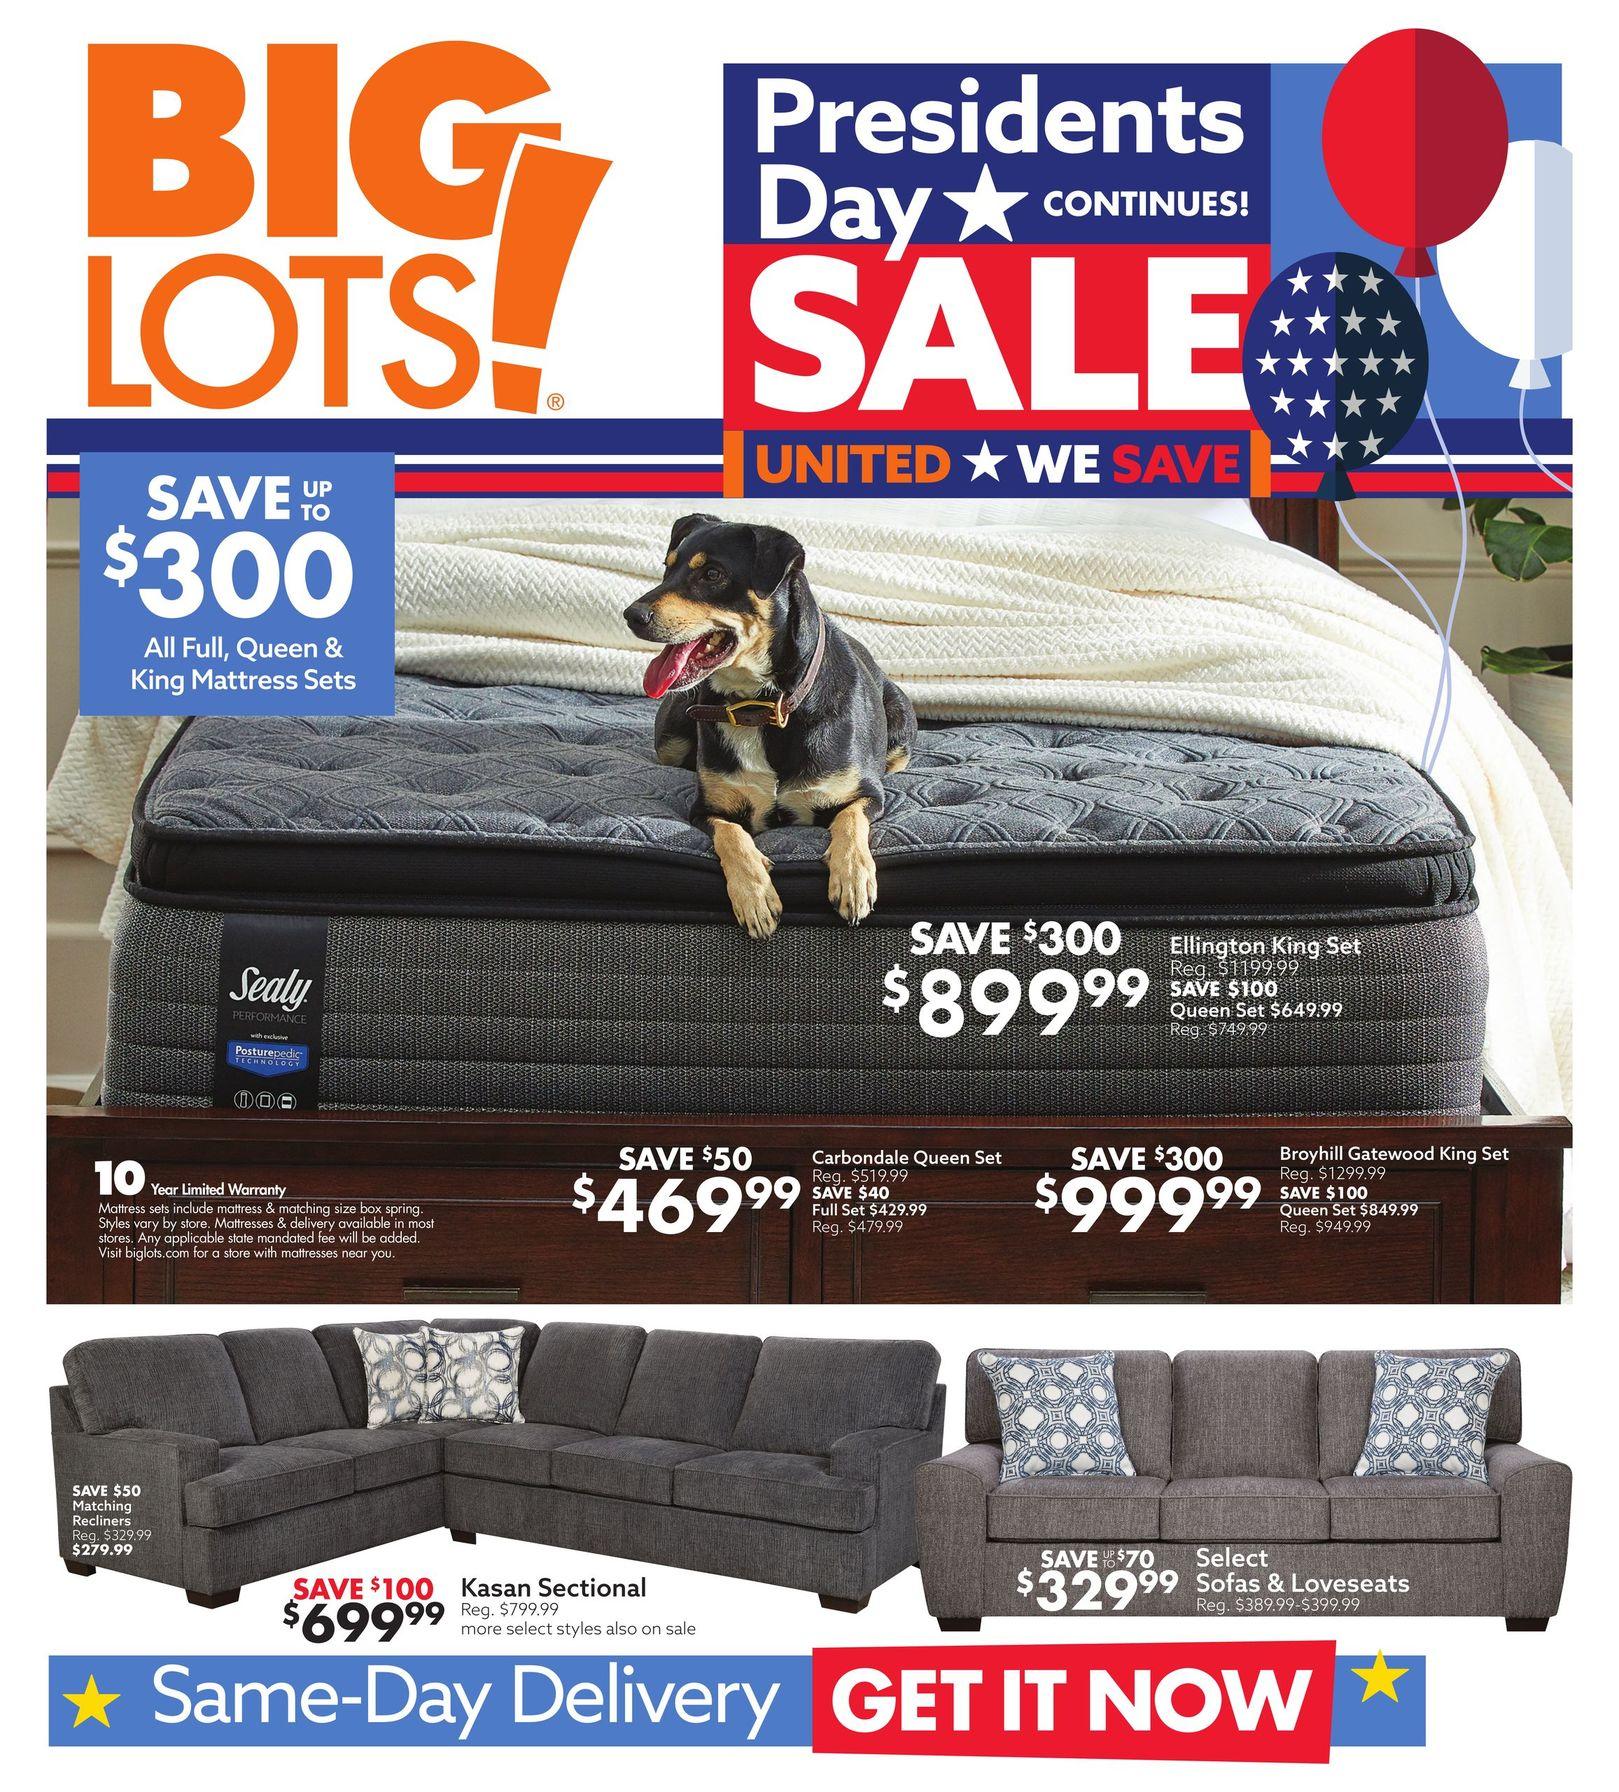 Big Lots Weekly Ad February 21 - February 27, 2021